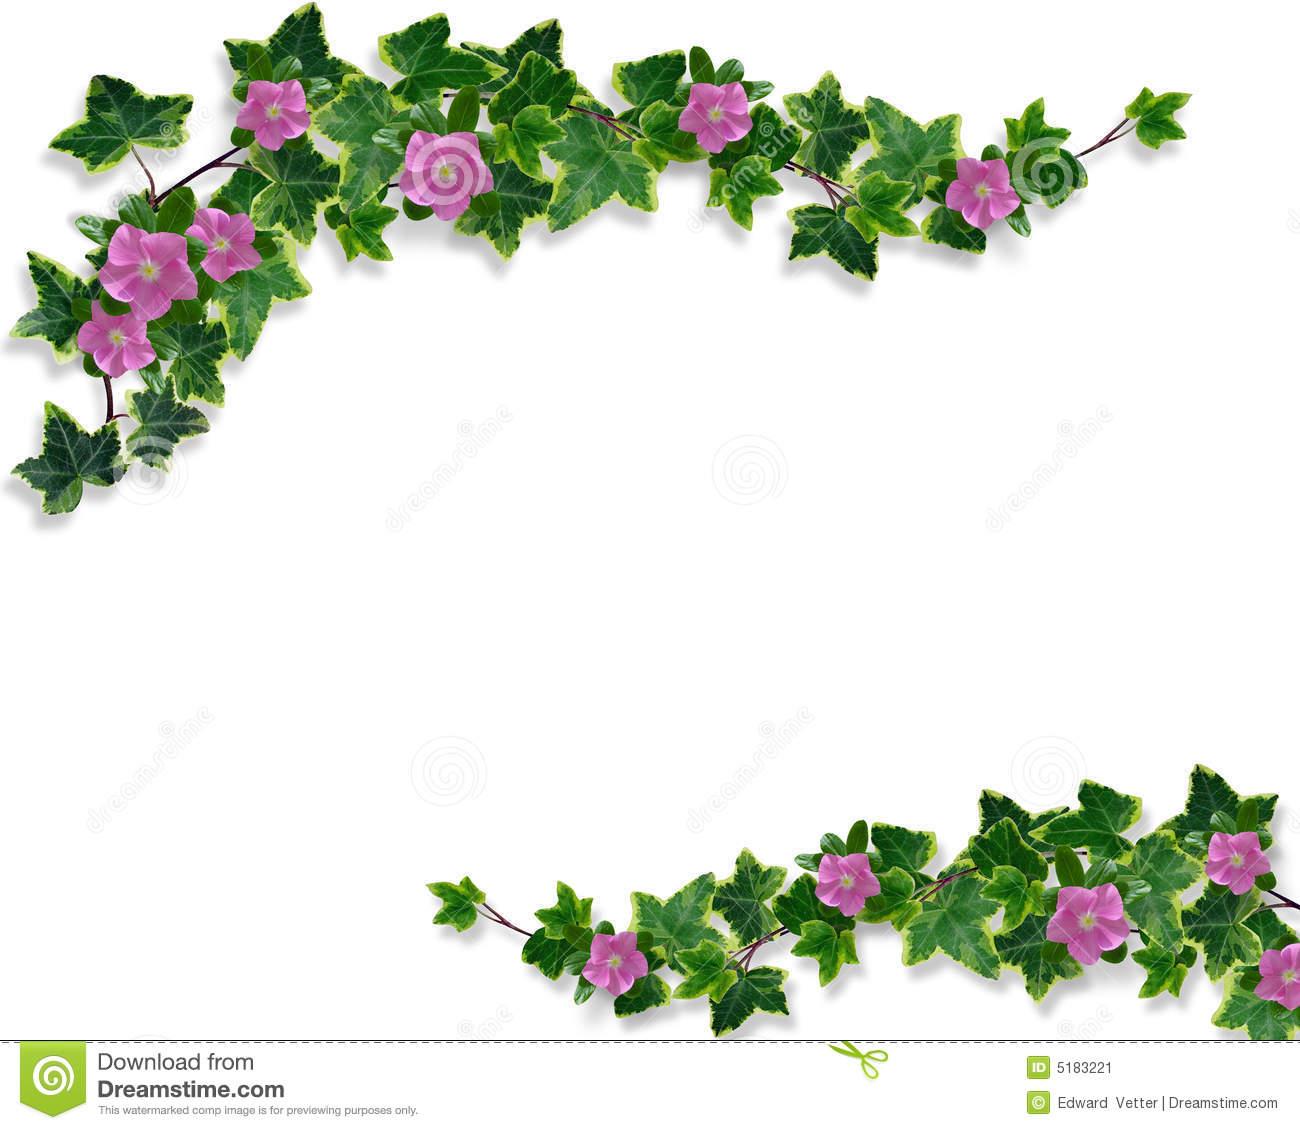 Simple flower designs border